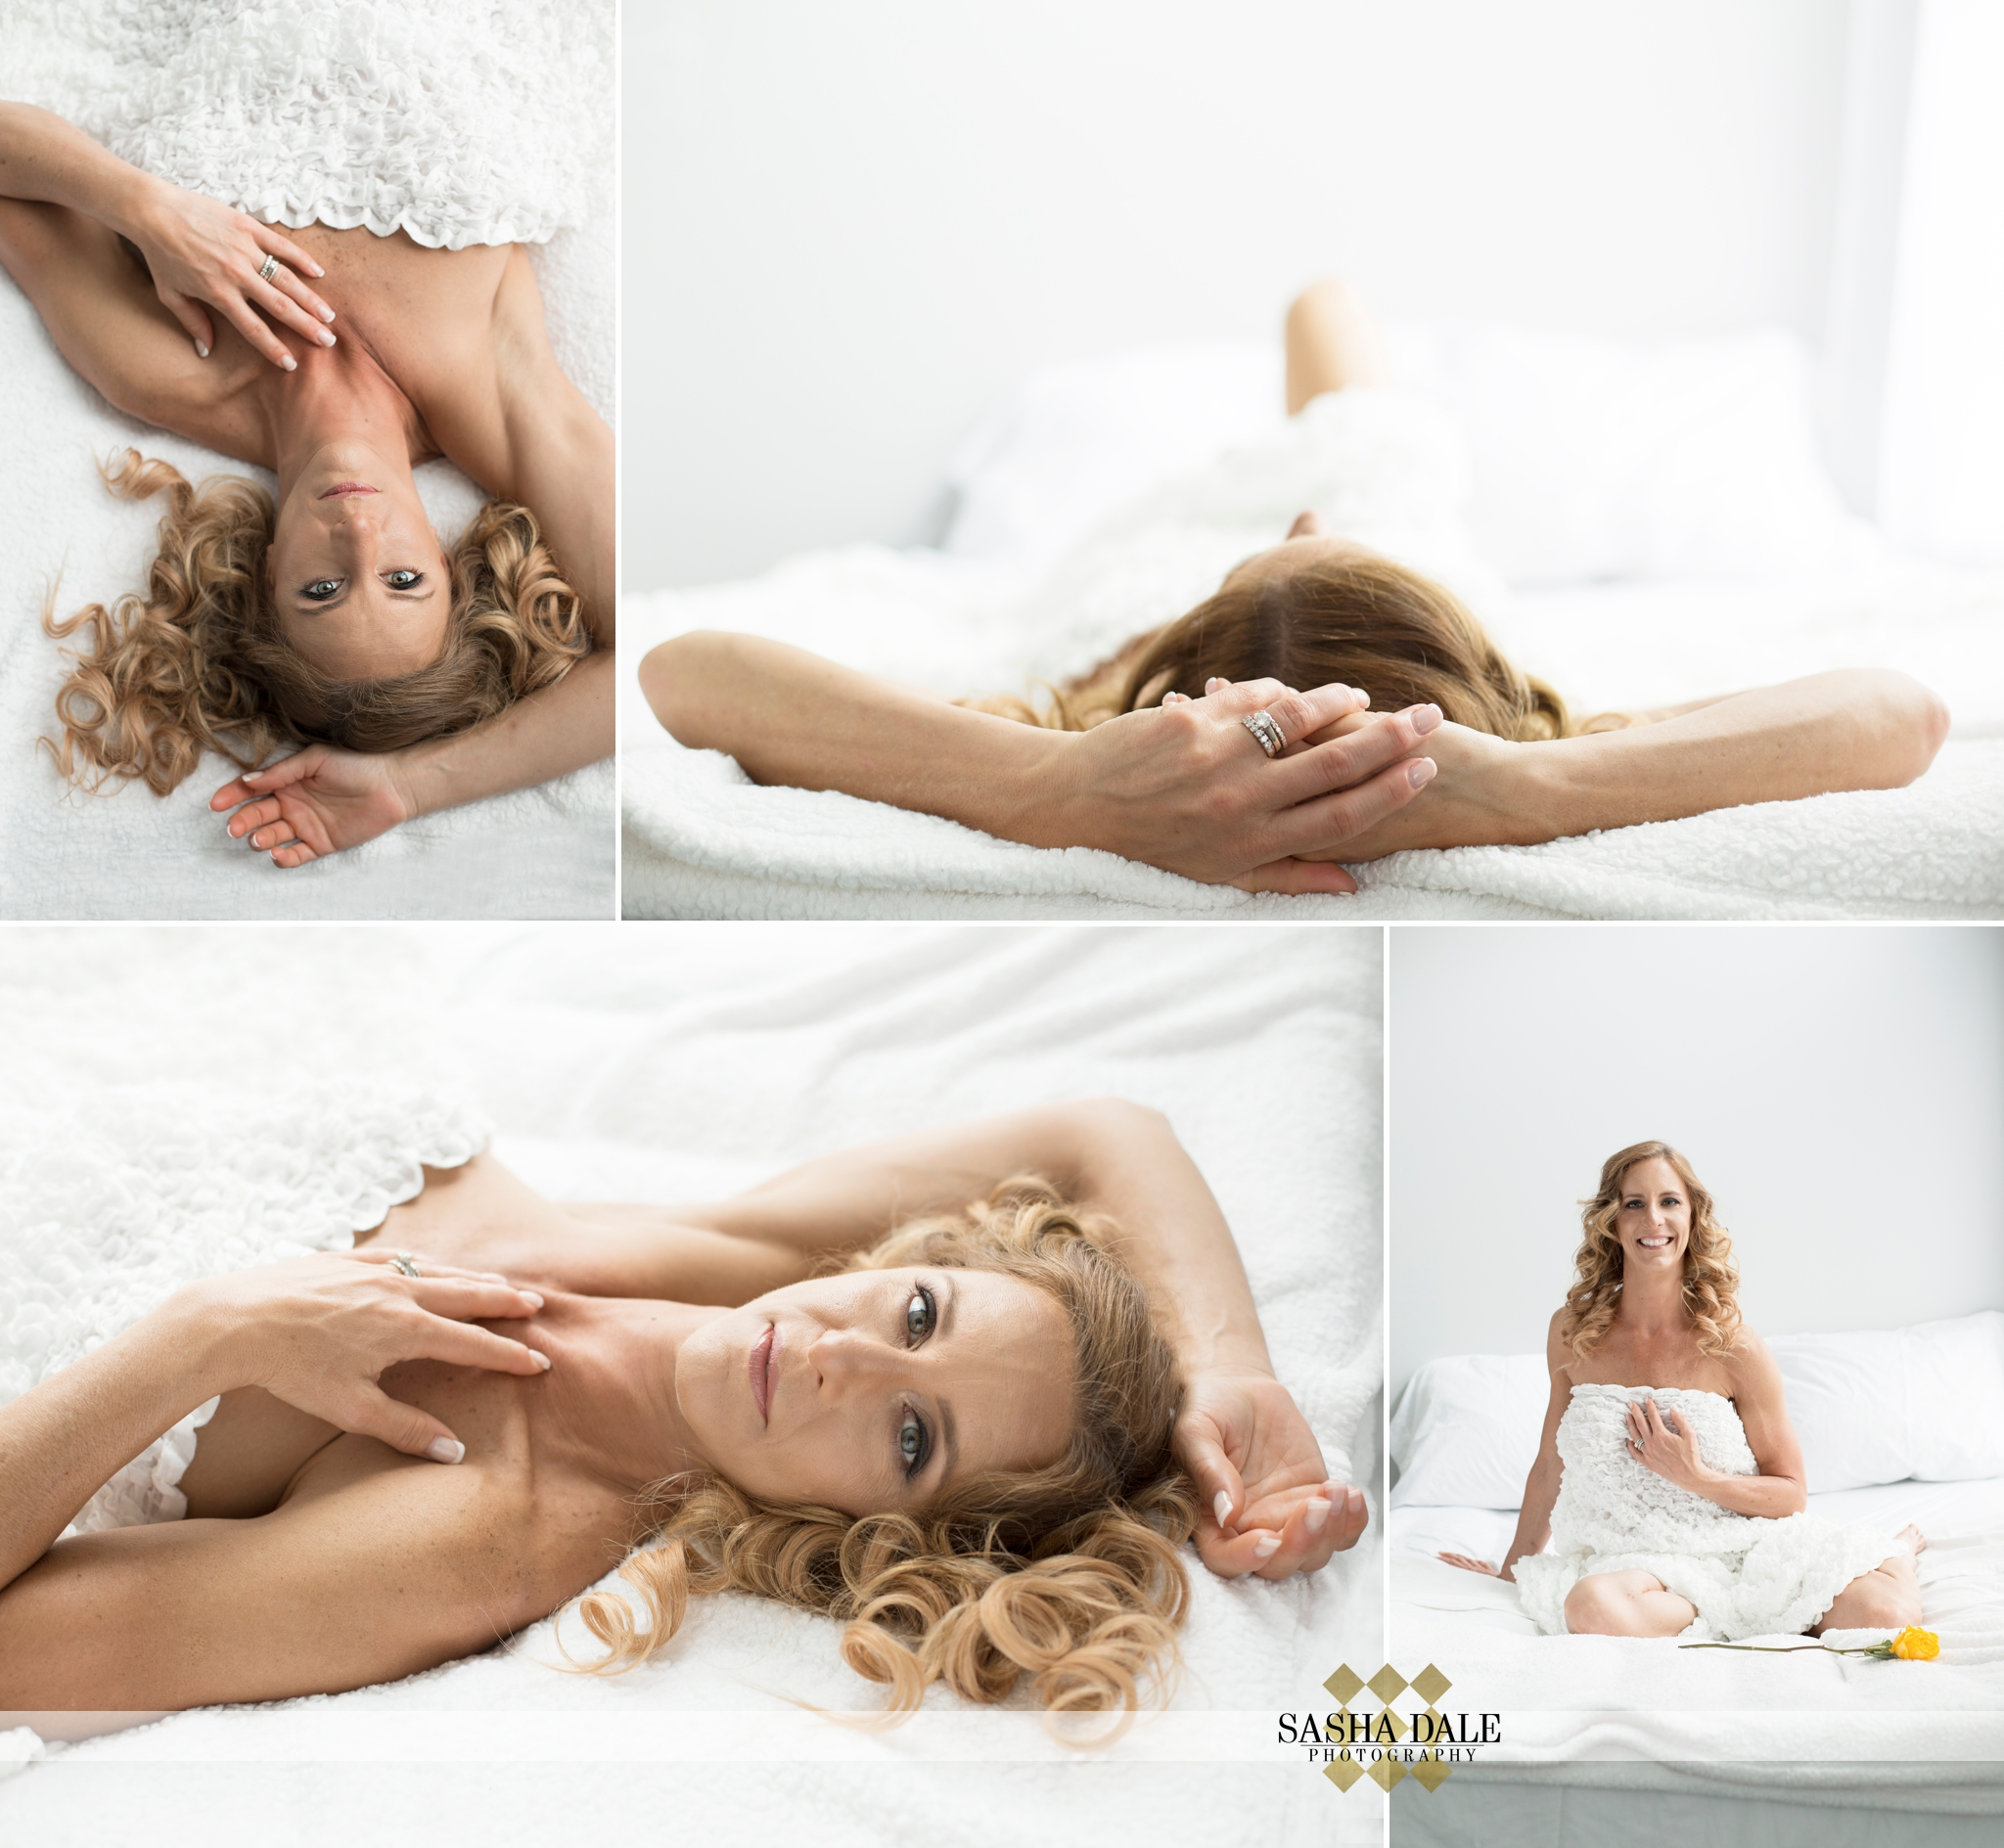 bodybuilding, fitness competition, CT boudoir, Connecticut boudoir photographer, sexy lingerie, white sheets, New Preston, Litchfield County